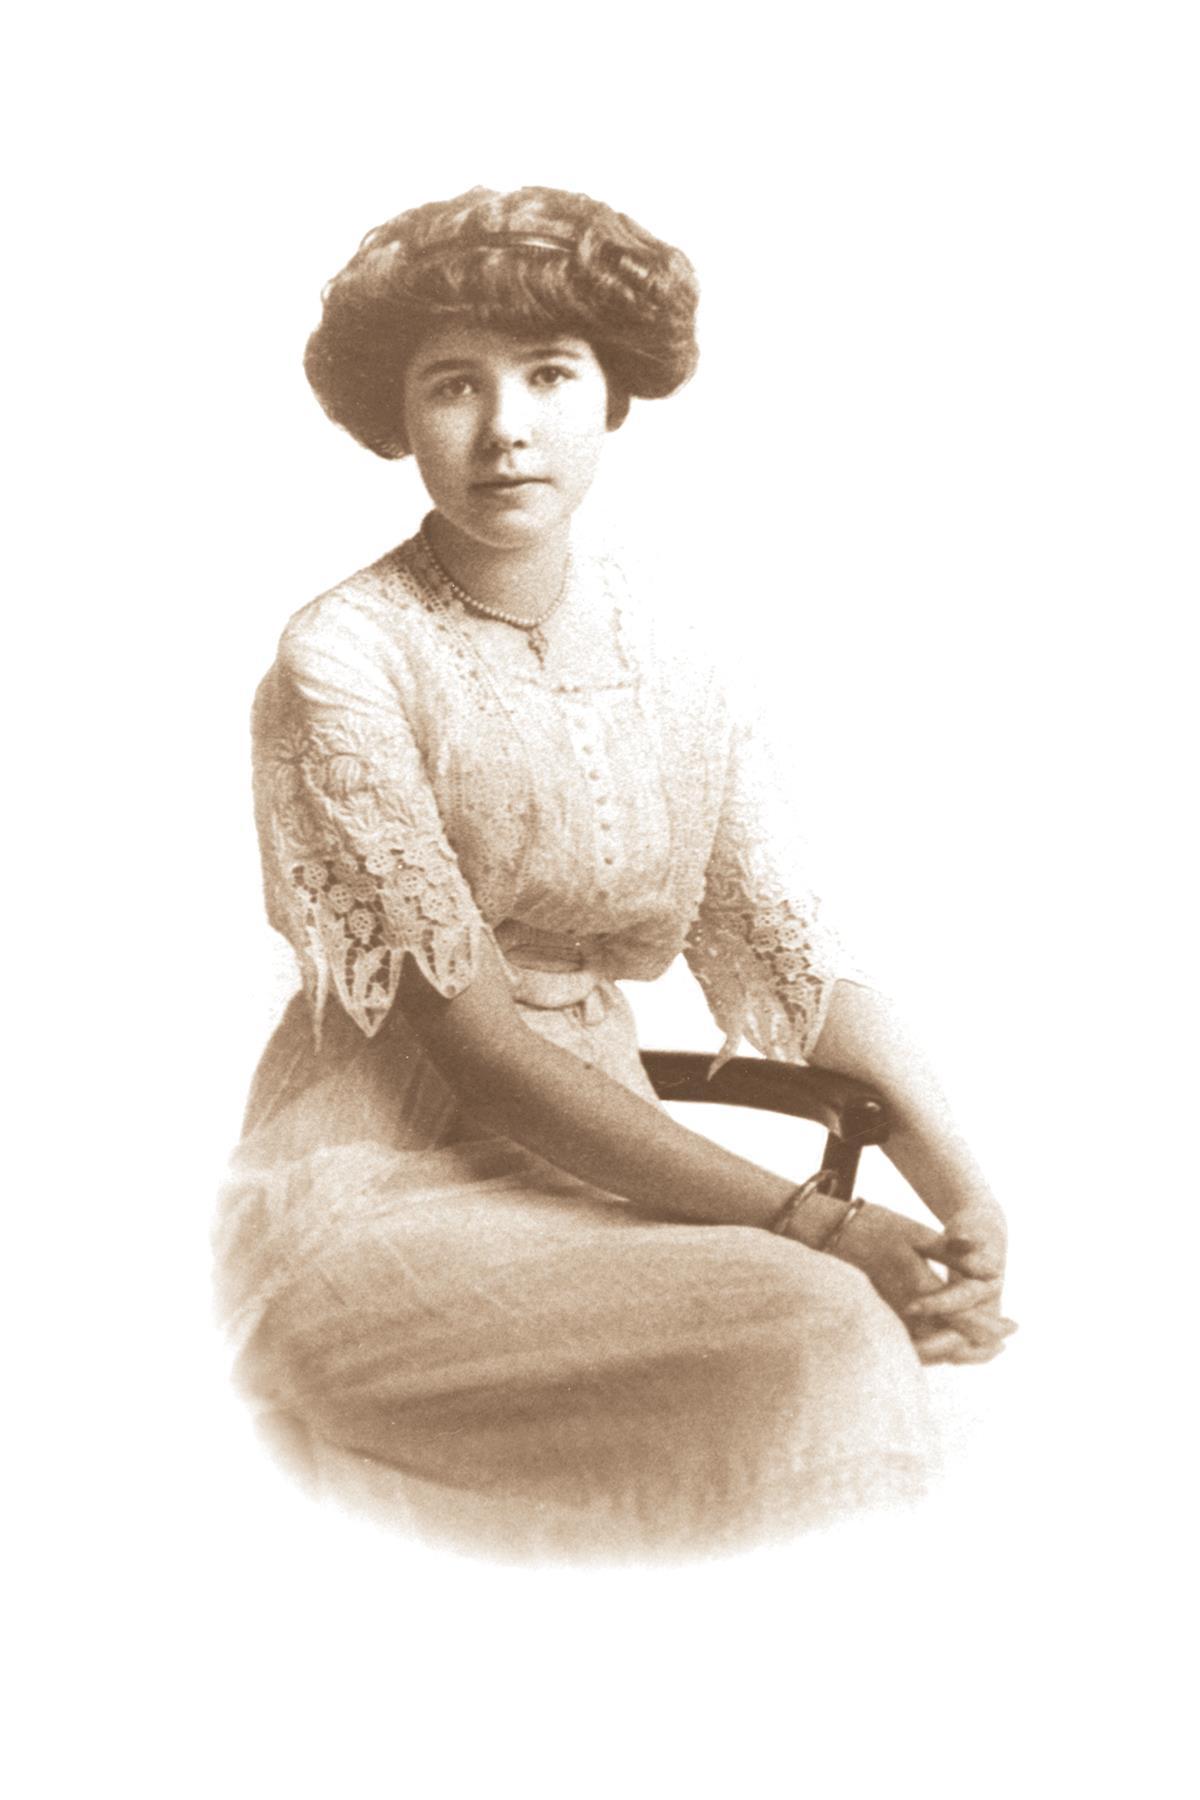 Ethel Donaghue